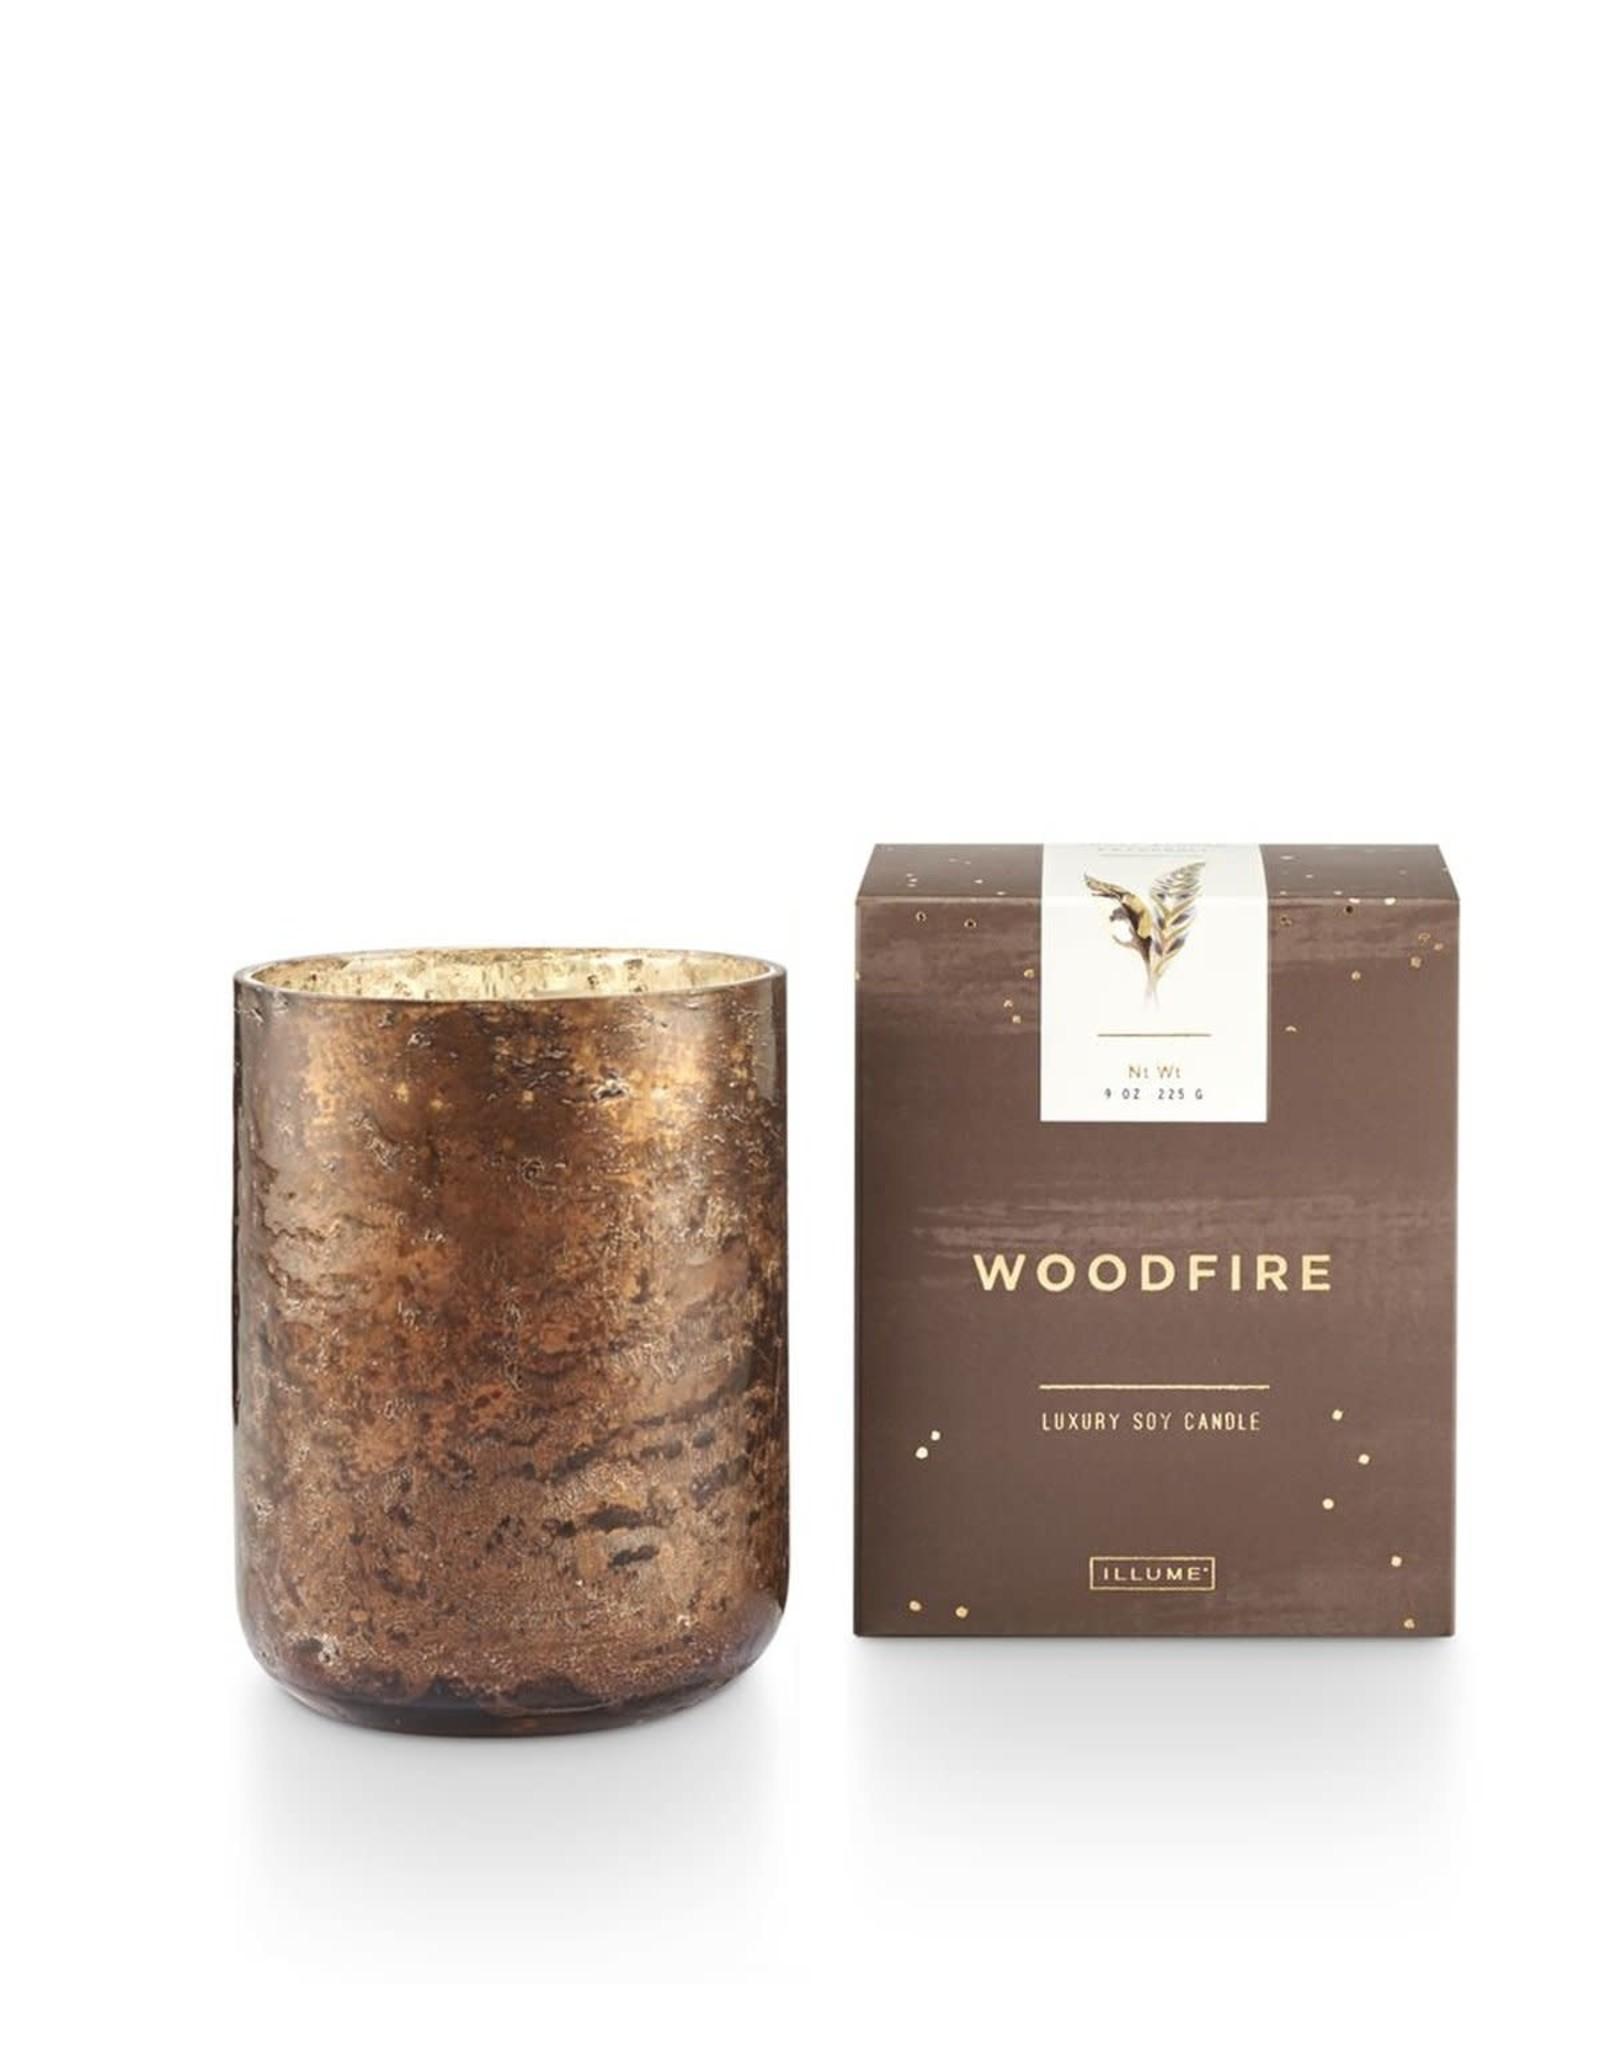 Oak + Arrow Interiors Woodfire Small Luxe - 9 oz